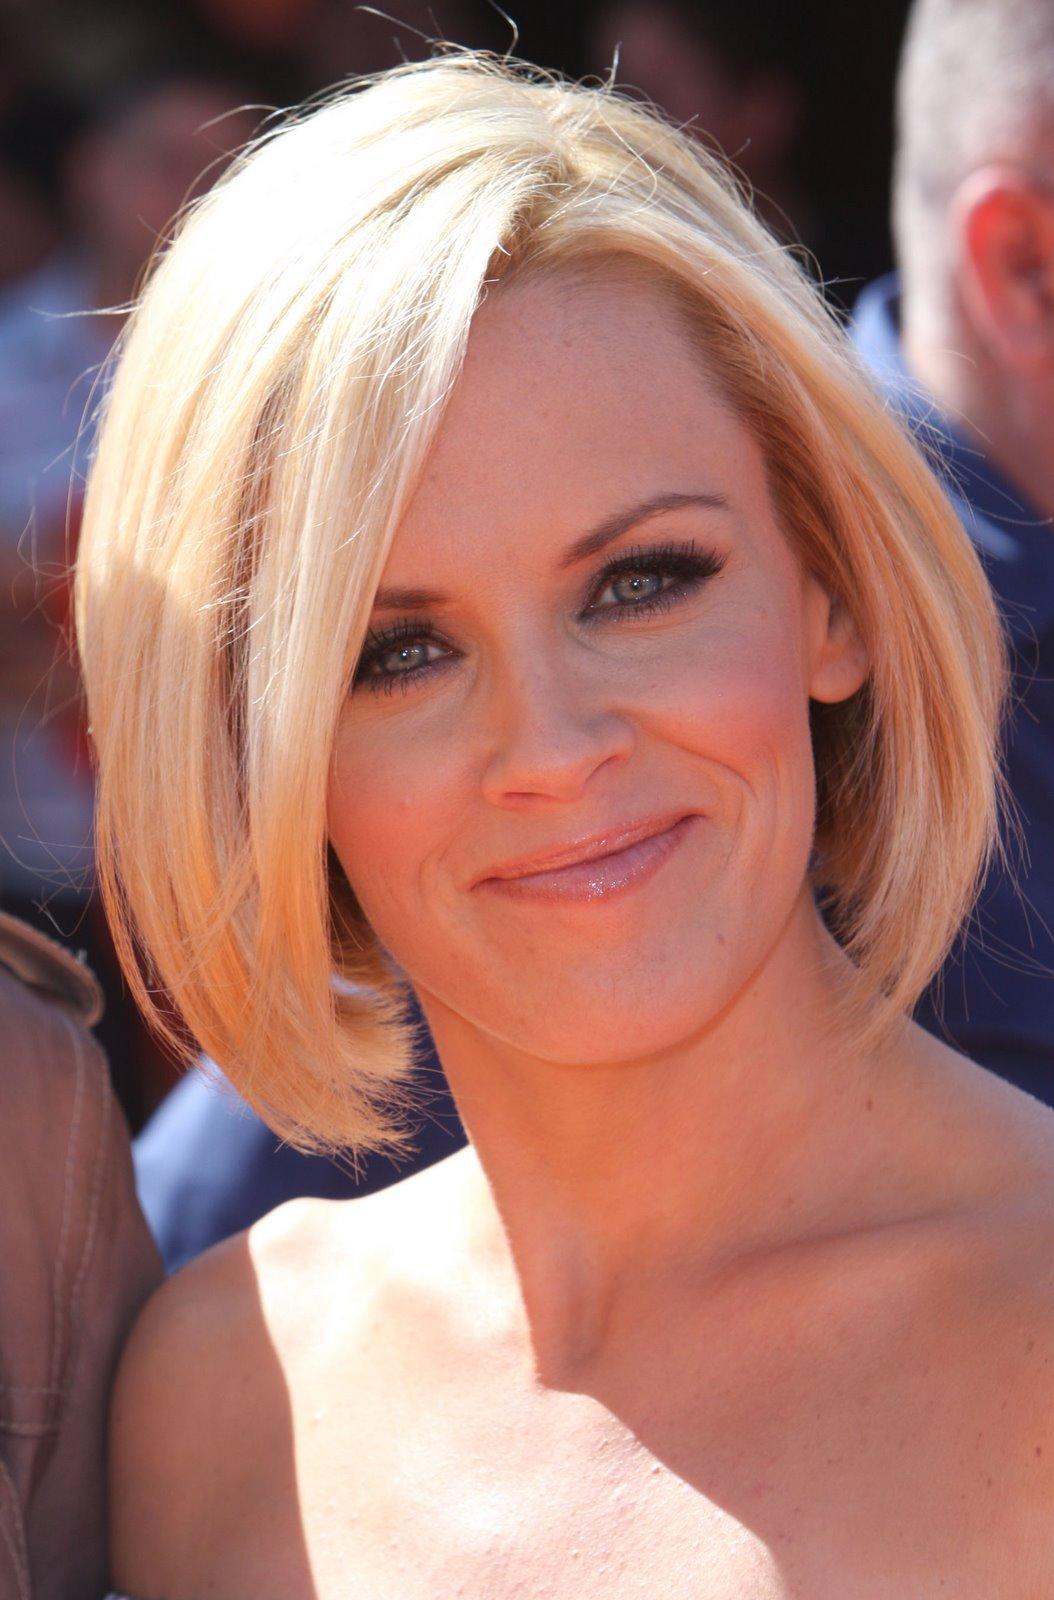 Blonde Angelina Jolie loves Short Hairstyles | epsos.de